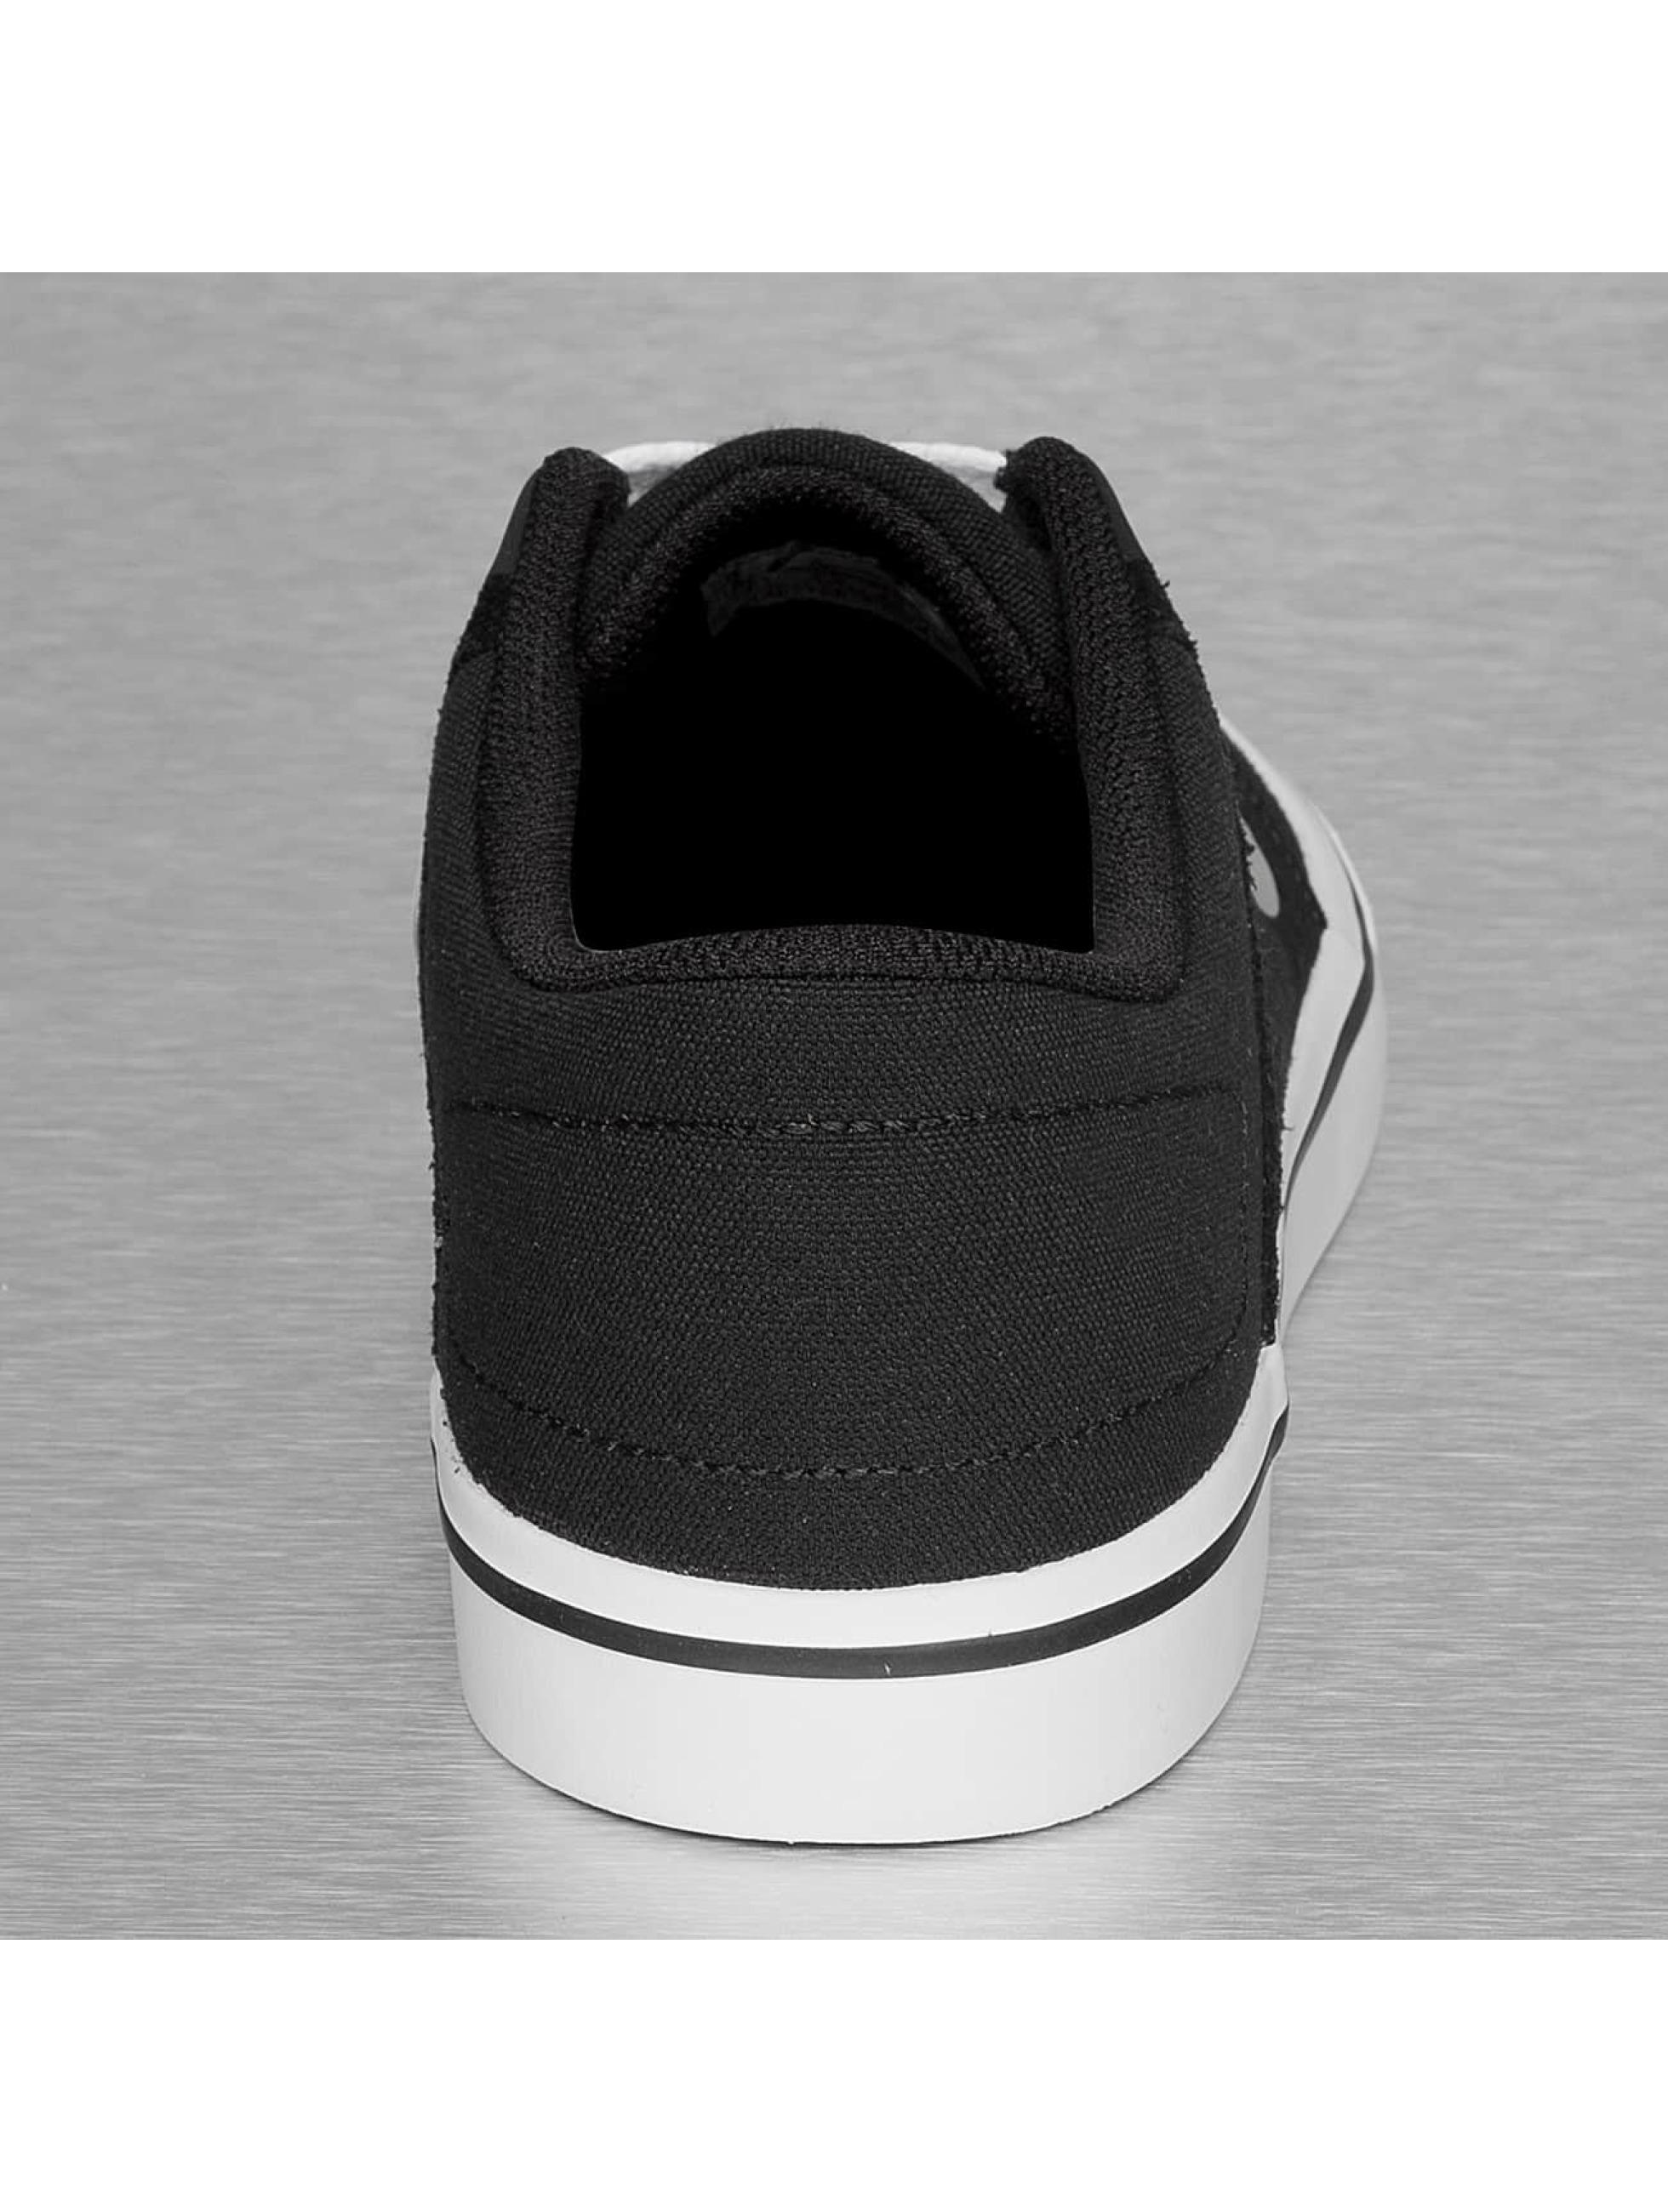 Nike SB Baskets SB Portmore noir